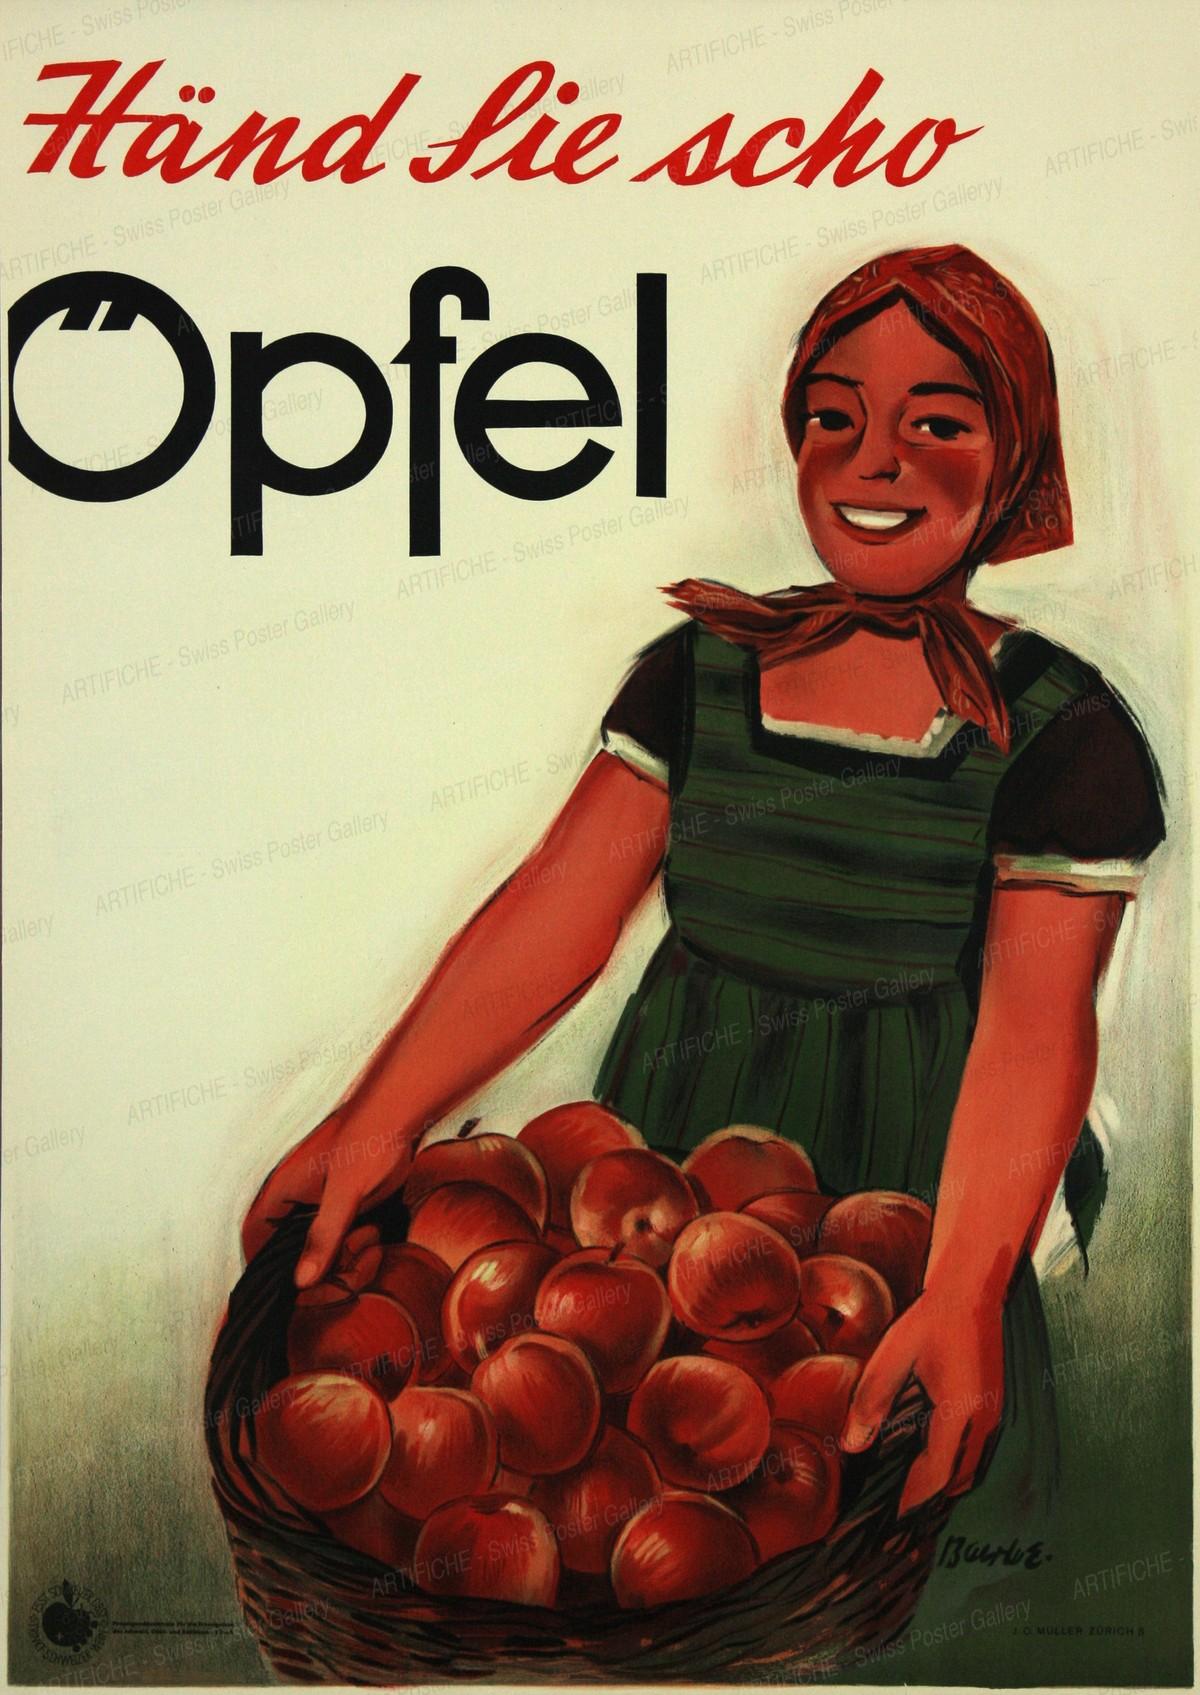 Have you got apples yet?, Hugo Laubi